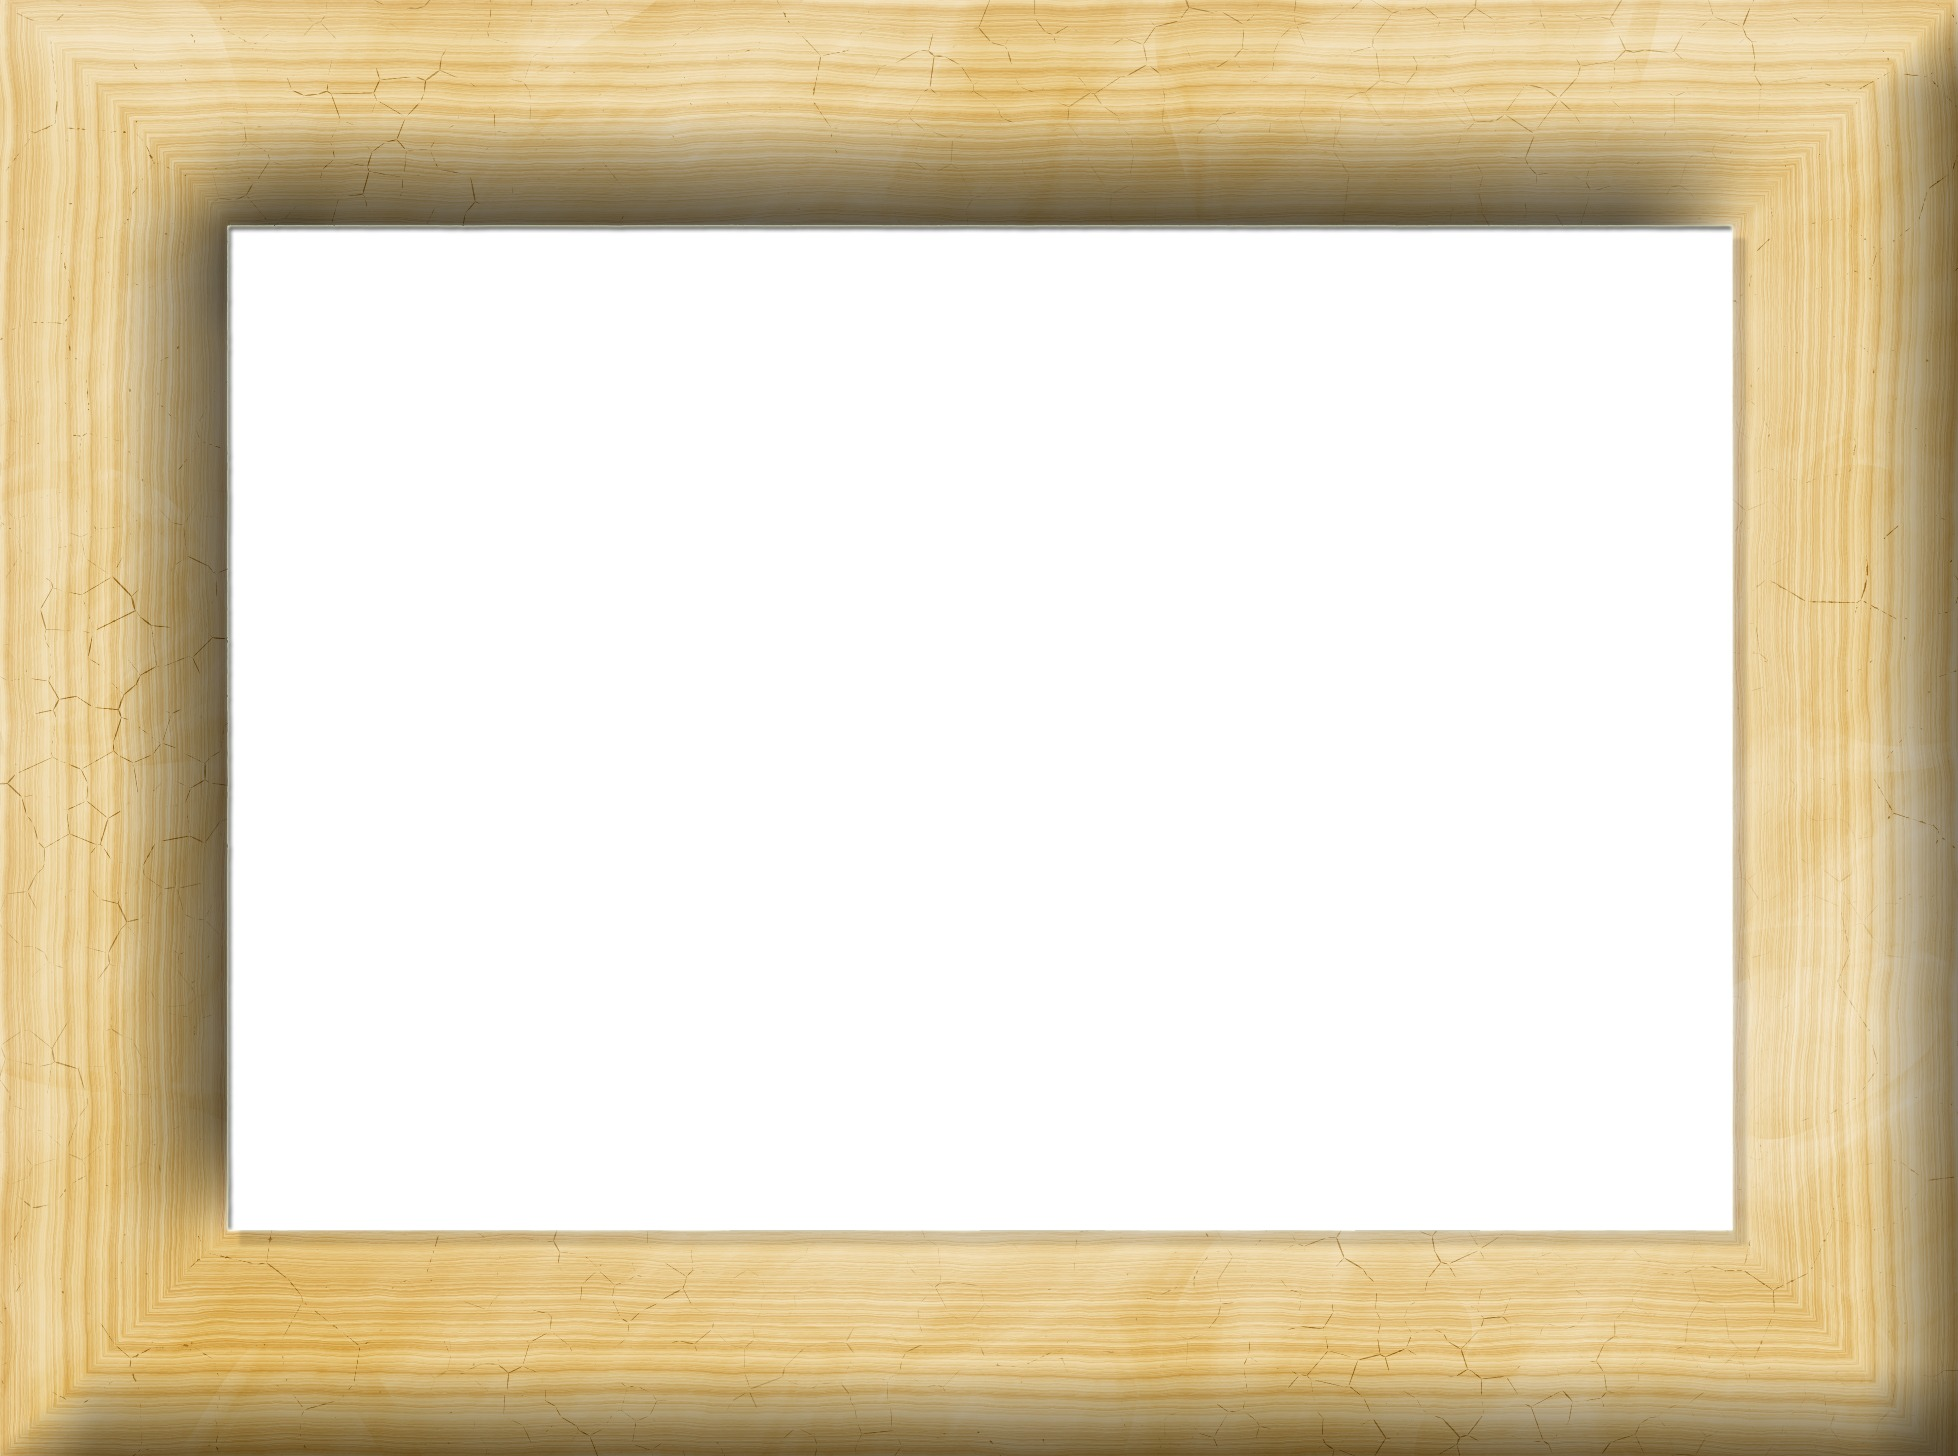 Wooden Frame Border Cracks Photopublicdomain Com